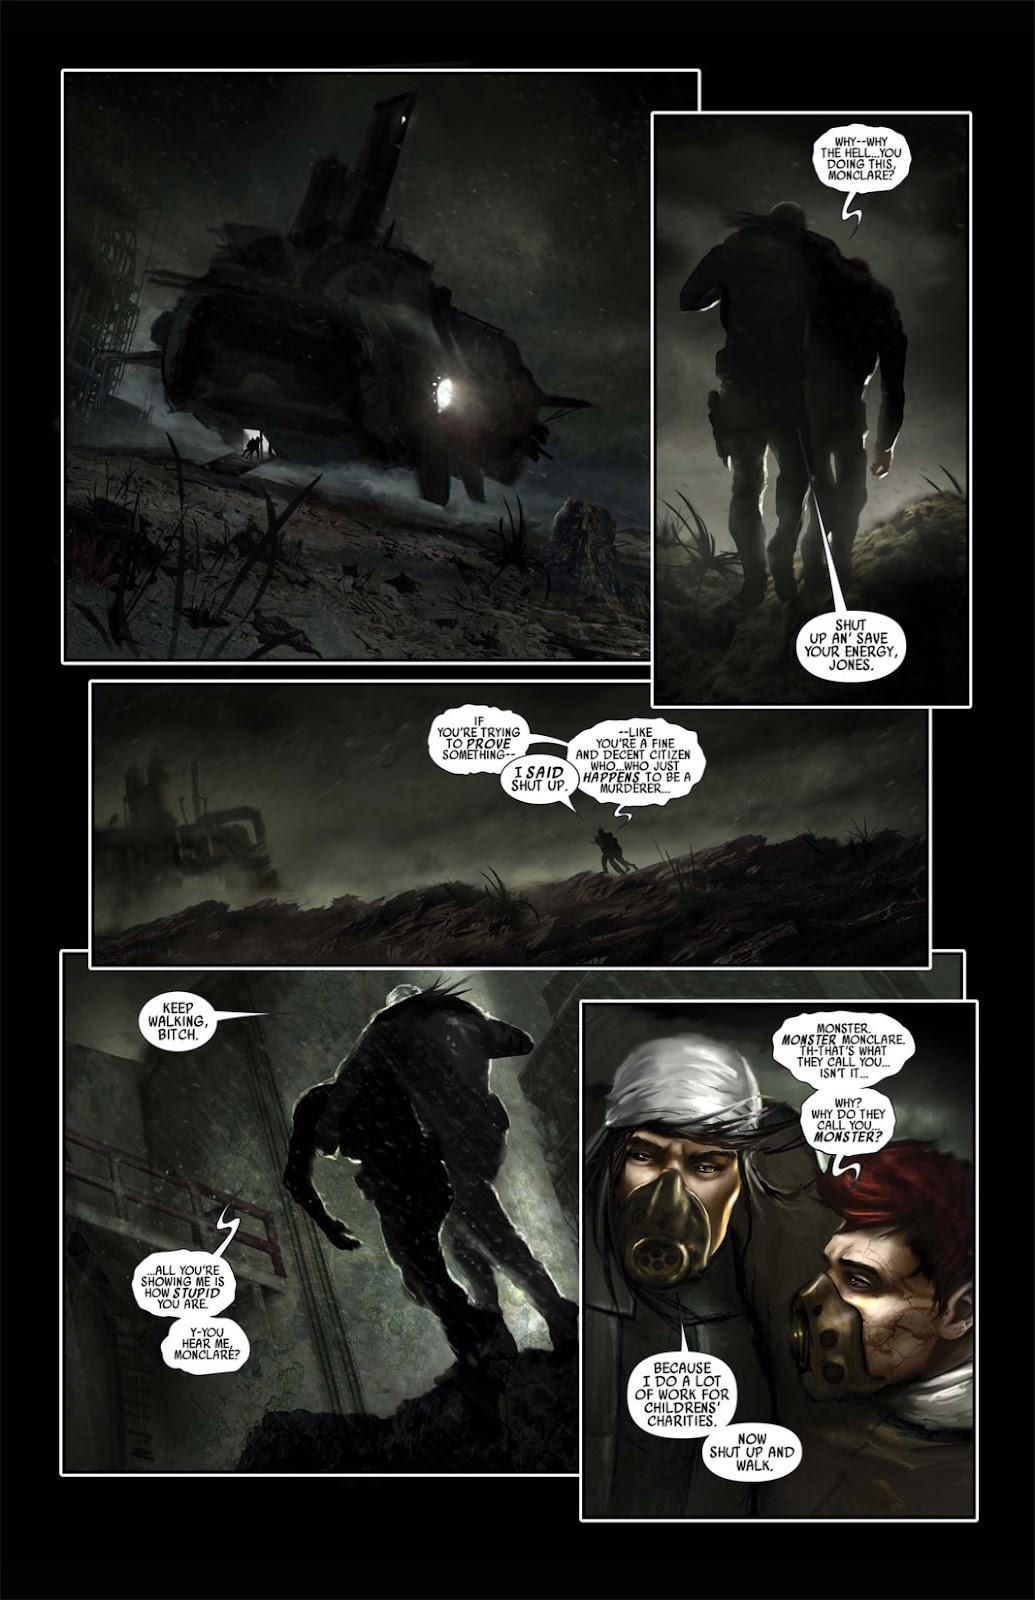 Read online After Dark comic -  Issue #1 - 41